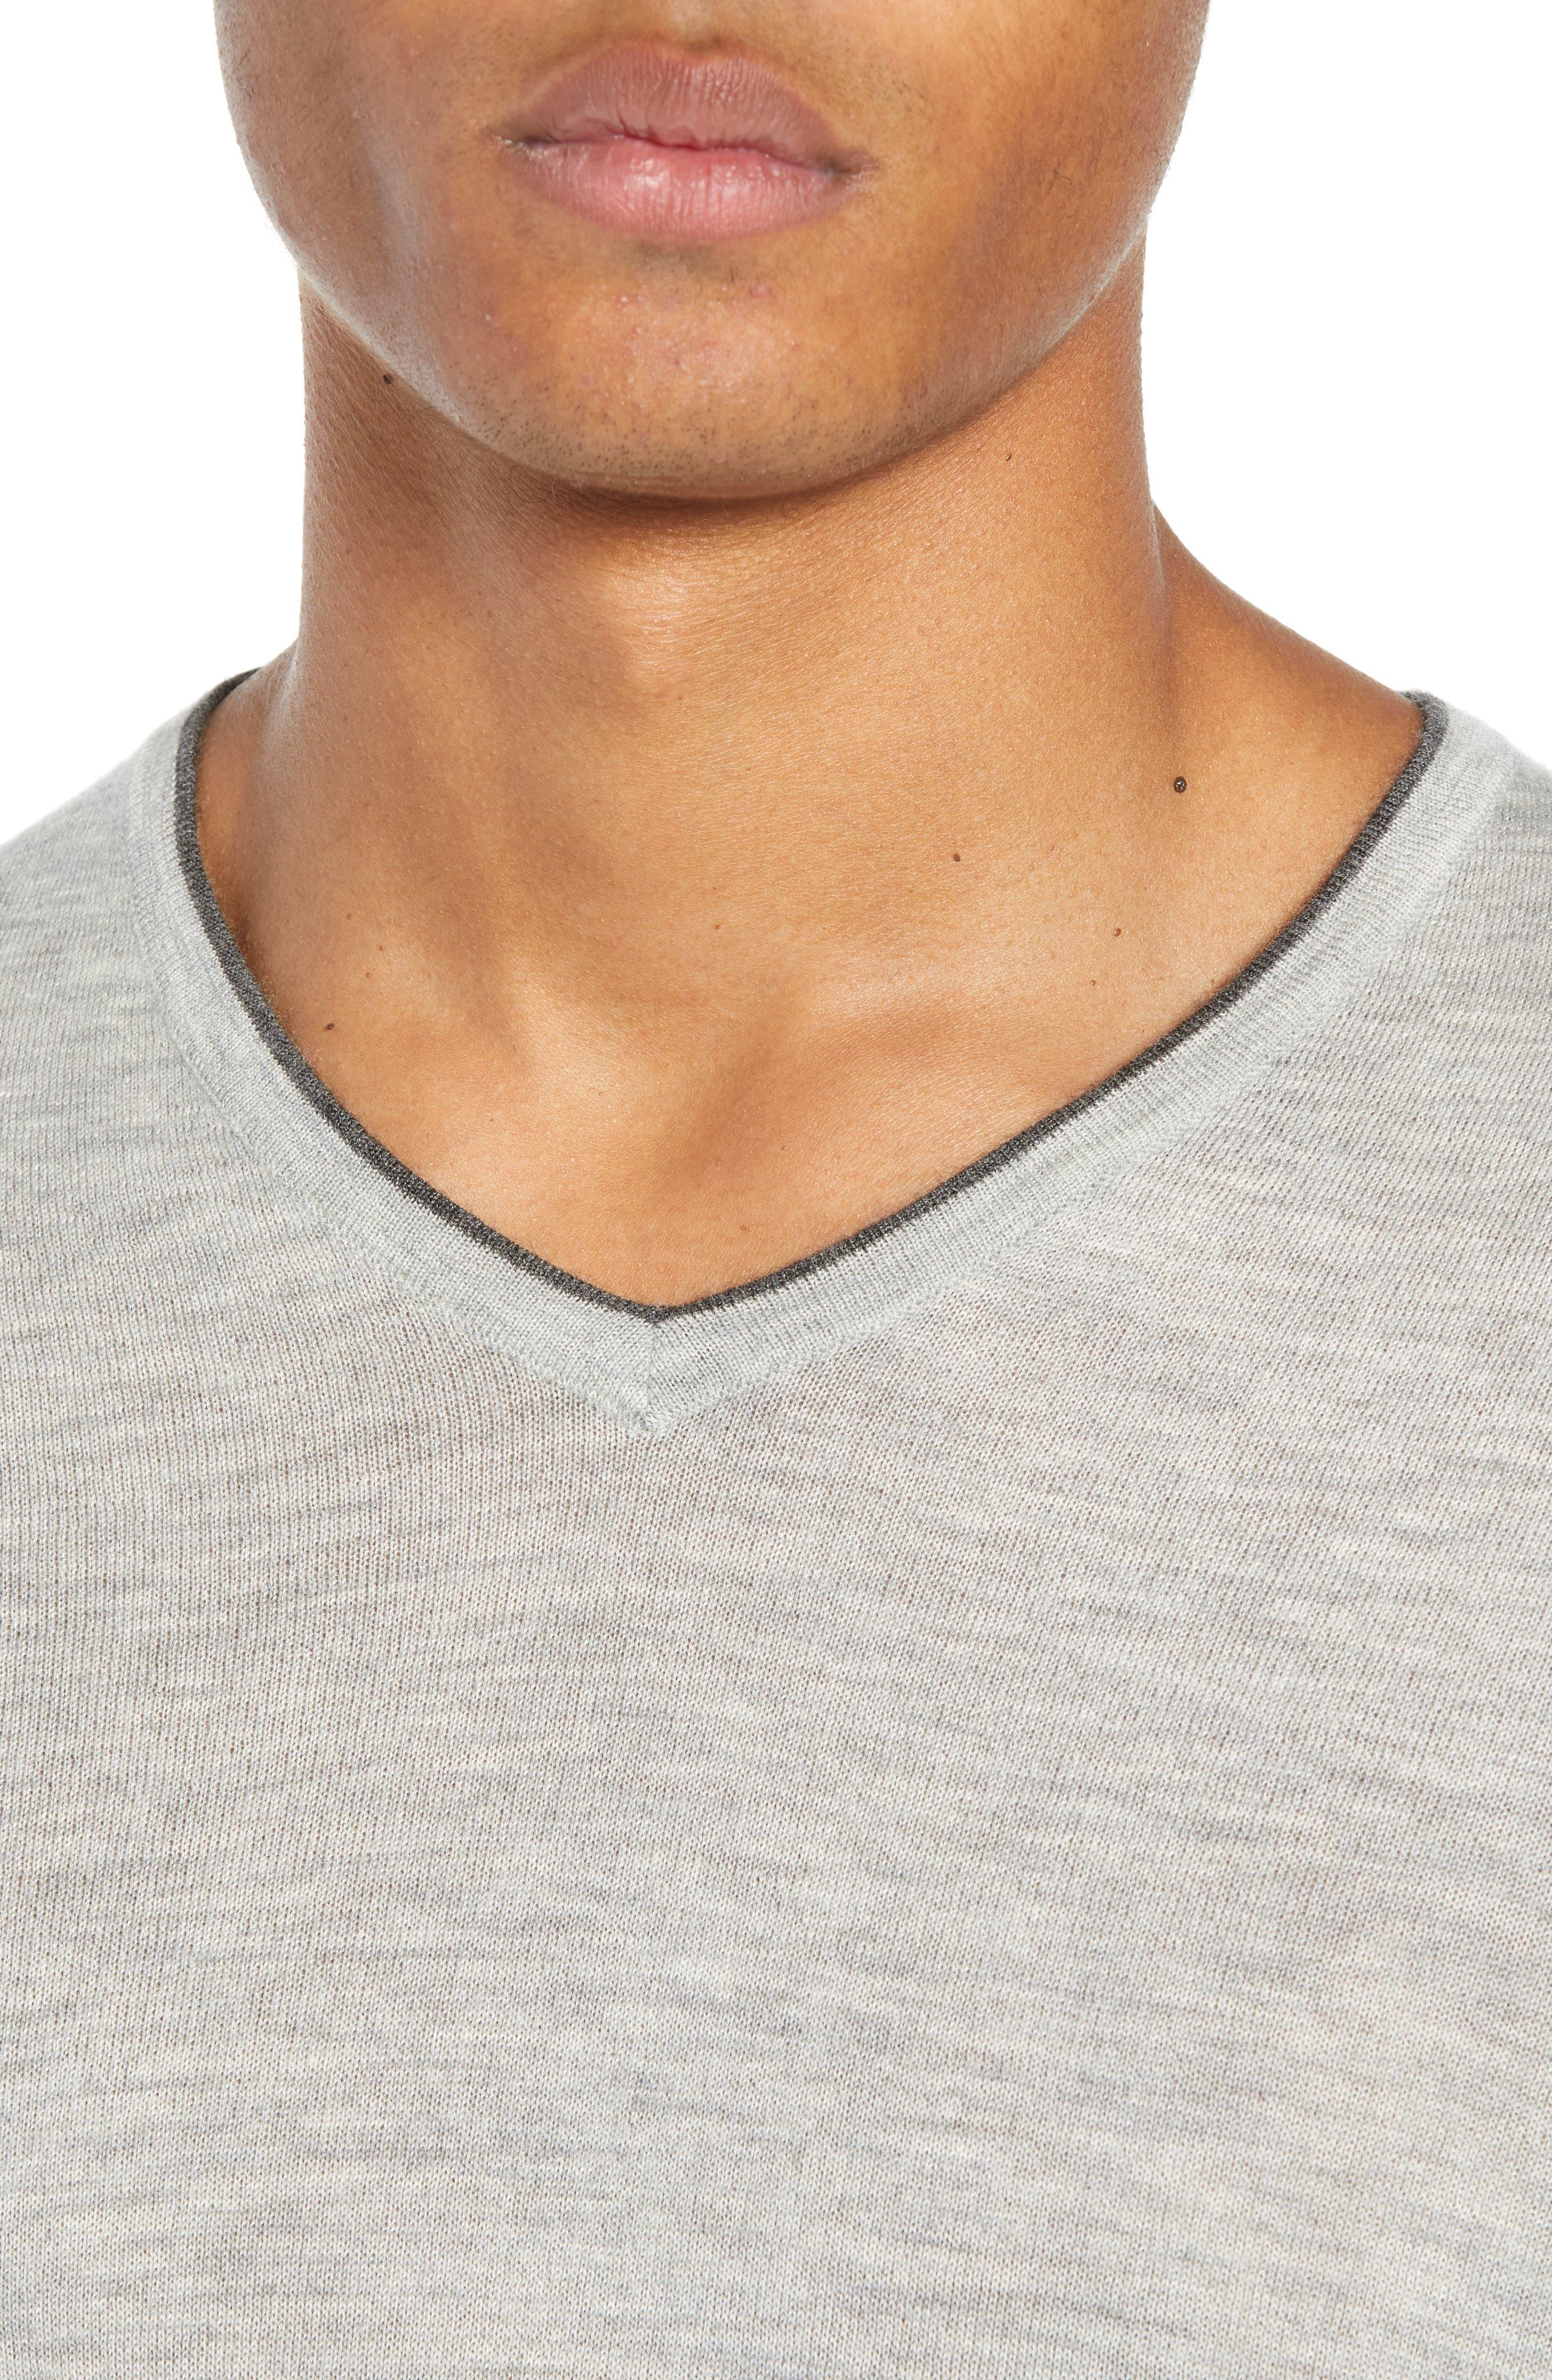 NORDSTROM SIGNATURE,                             Cashmere V-Neck Sweater,                             Alternate thumbnail 4, color,                             050